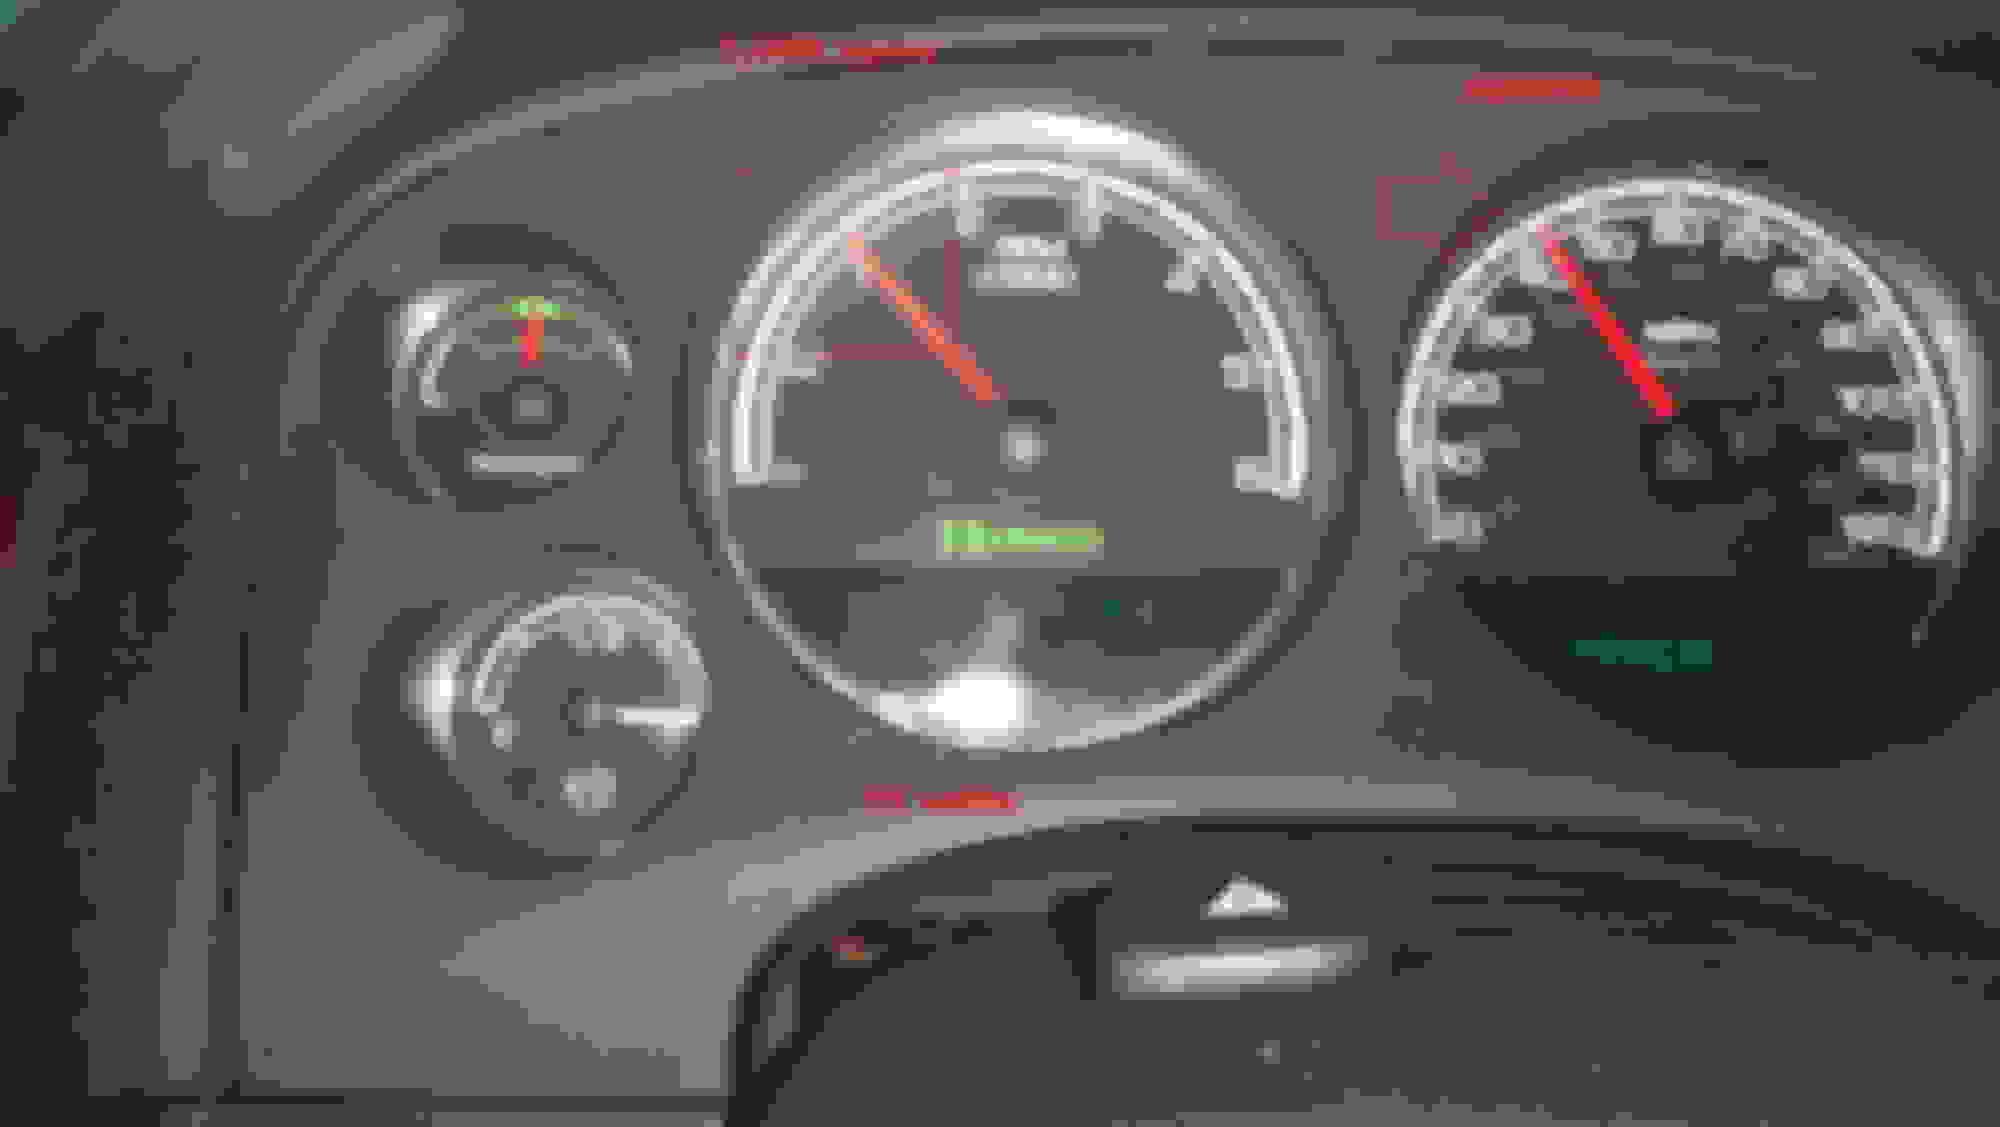 09 Yukon Hybrid lurch from Auto Stop to Engine - GreenHybrid